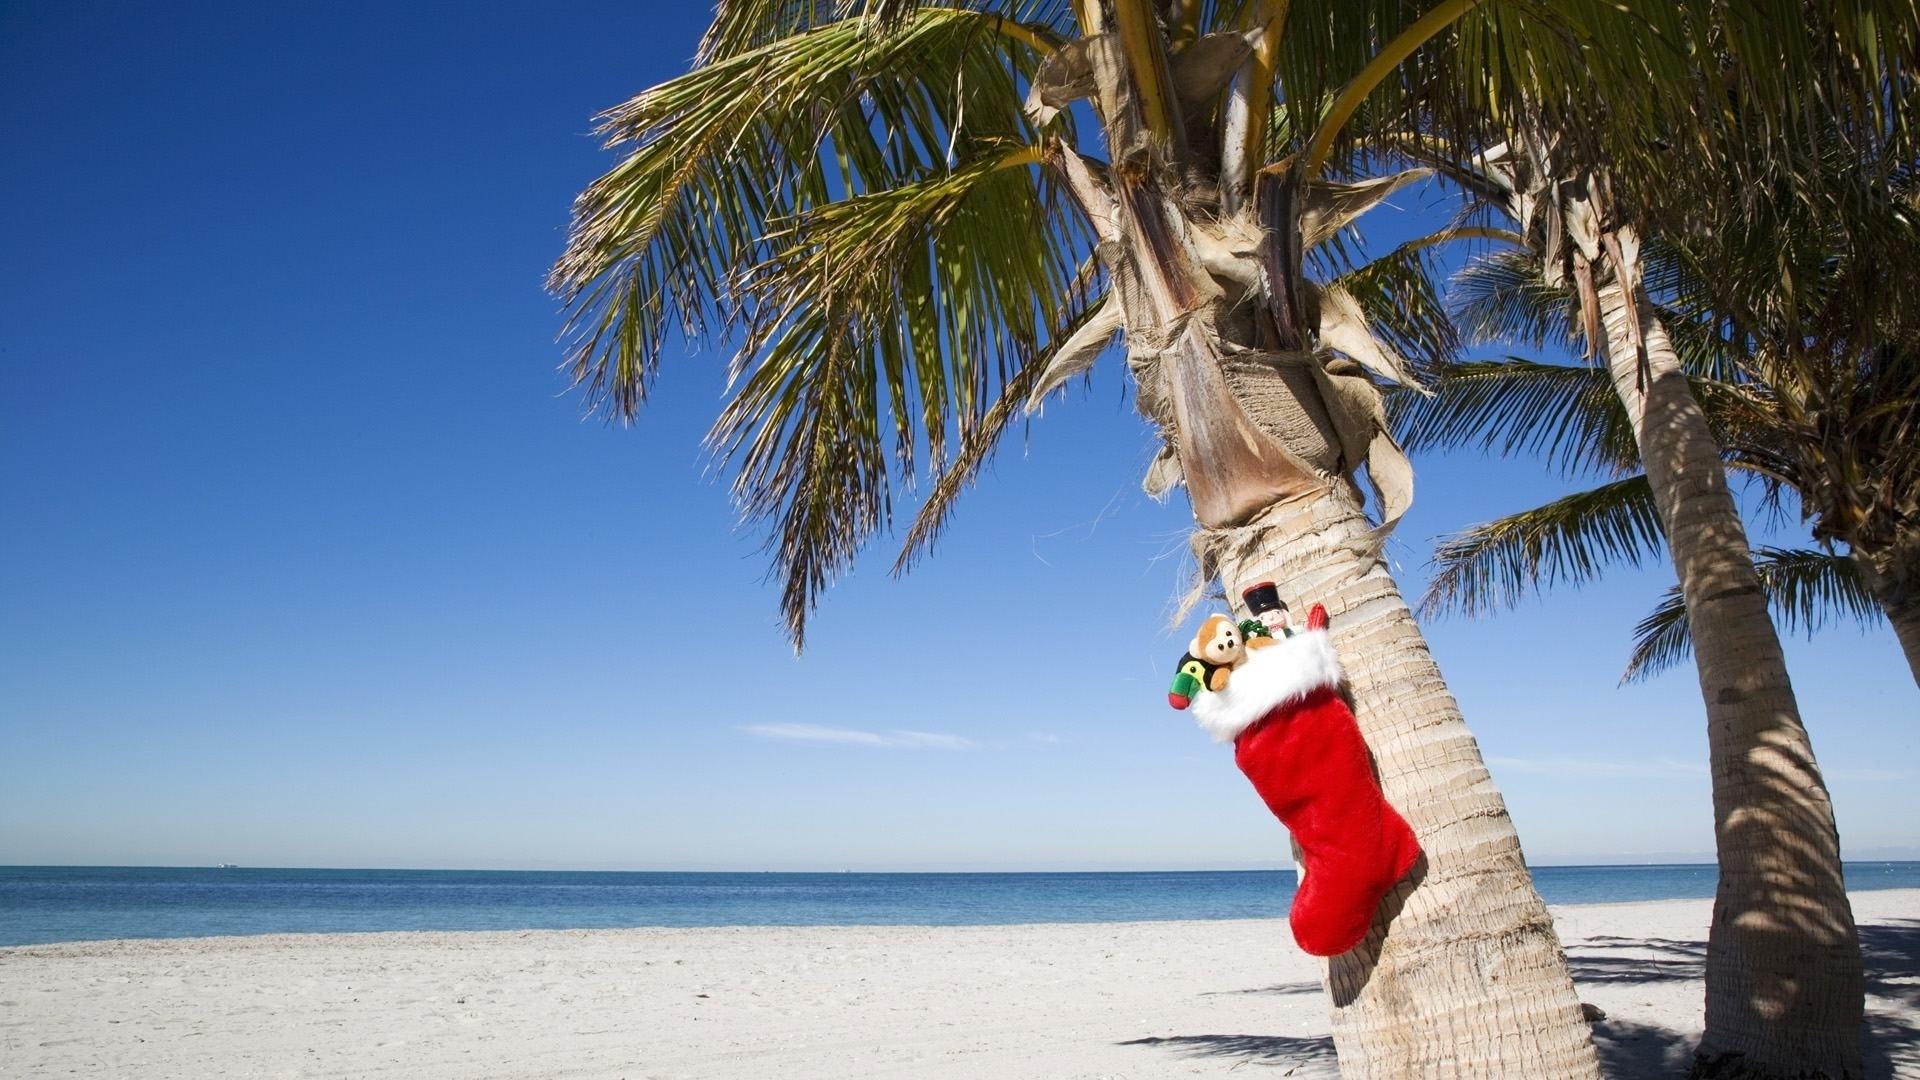 merry christmas beach facebook cover